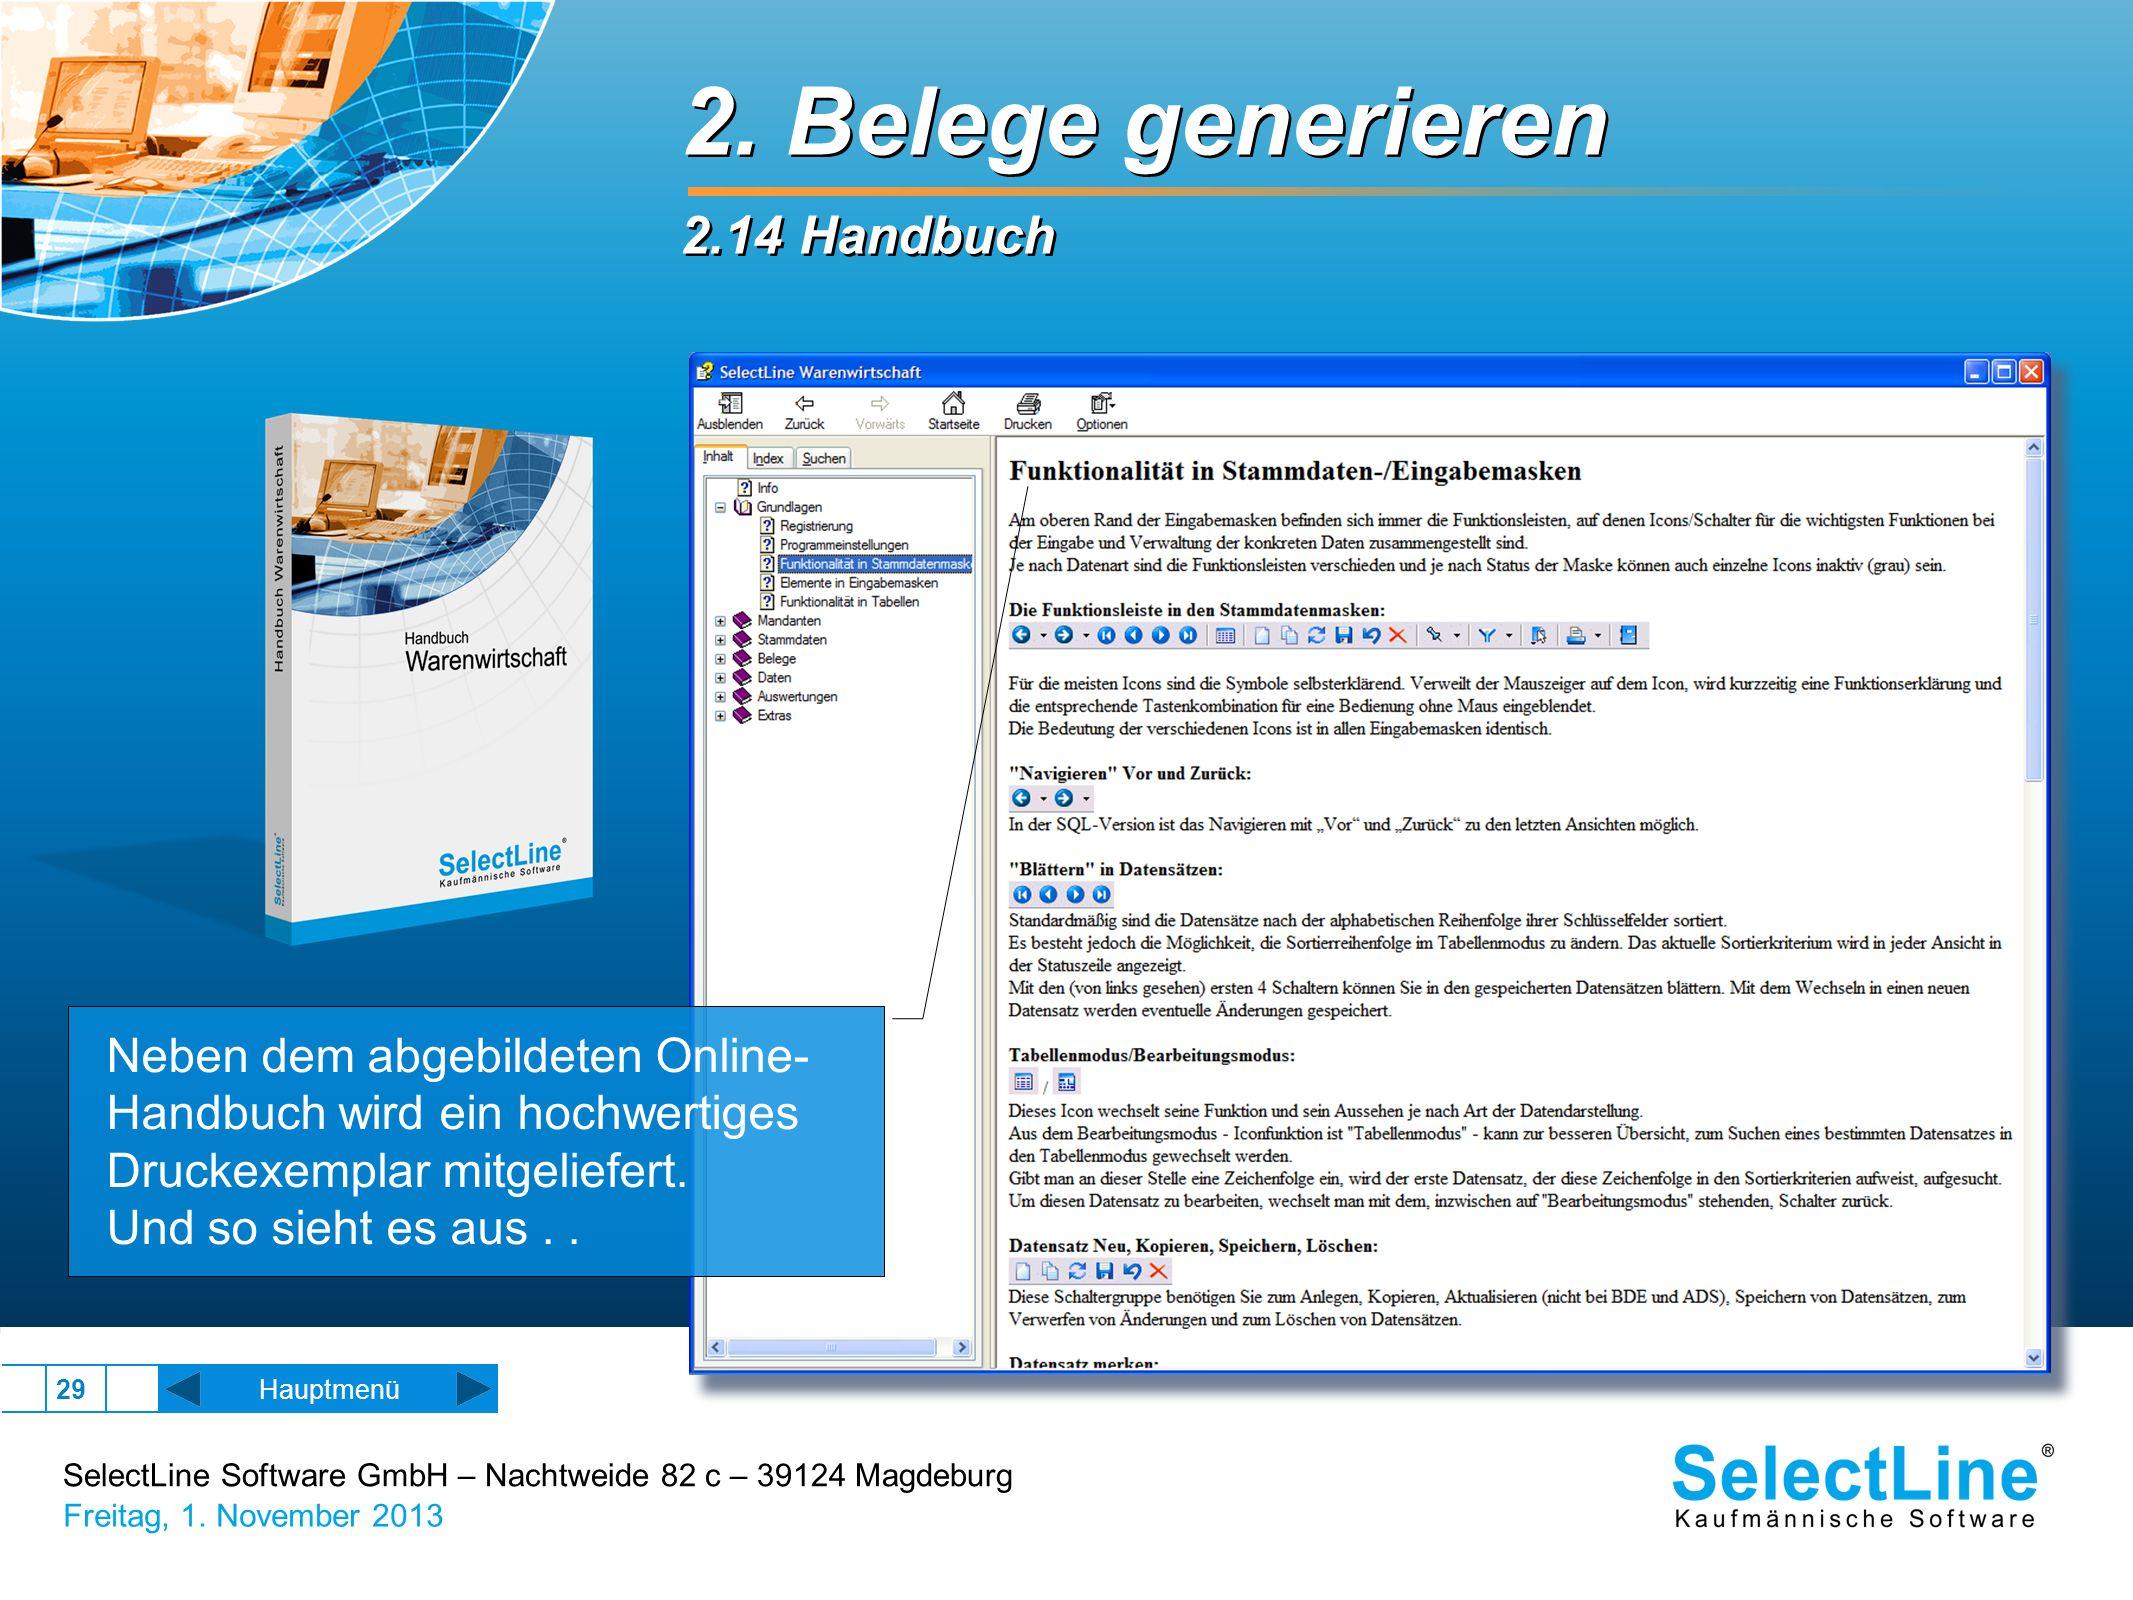 SelectLine Software GmbH – Nachtweide 82 c – 39124 Magdeburg Freitag, 1. November 2013 29 2. Belege generieren 2.14 Handbuch 2. Belege generieren 2.14